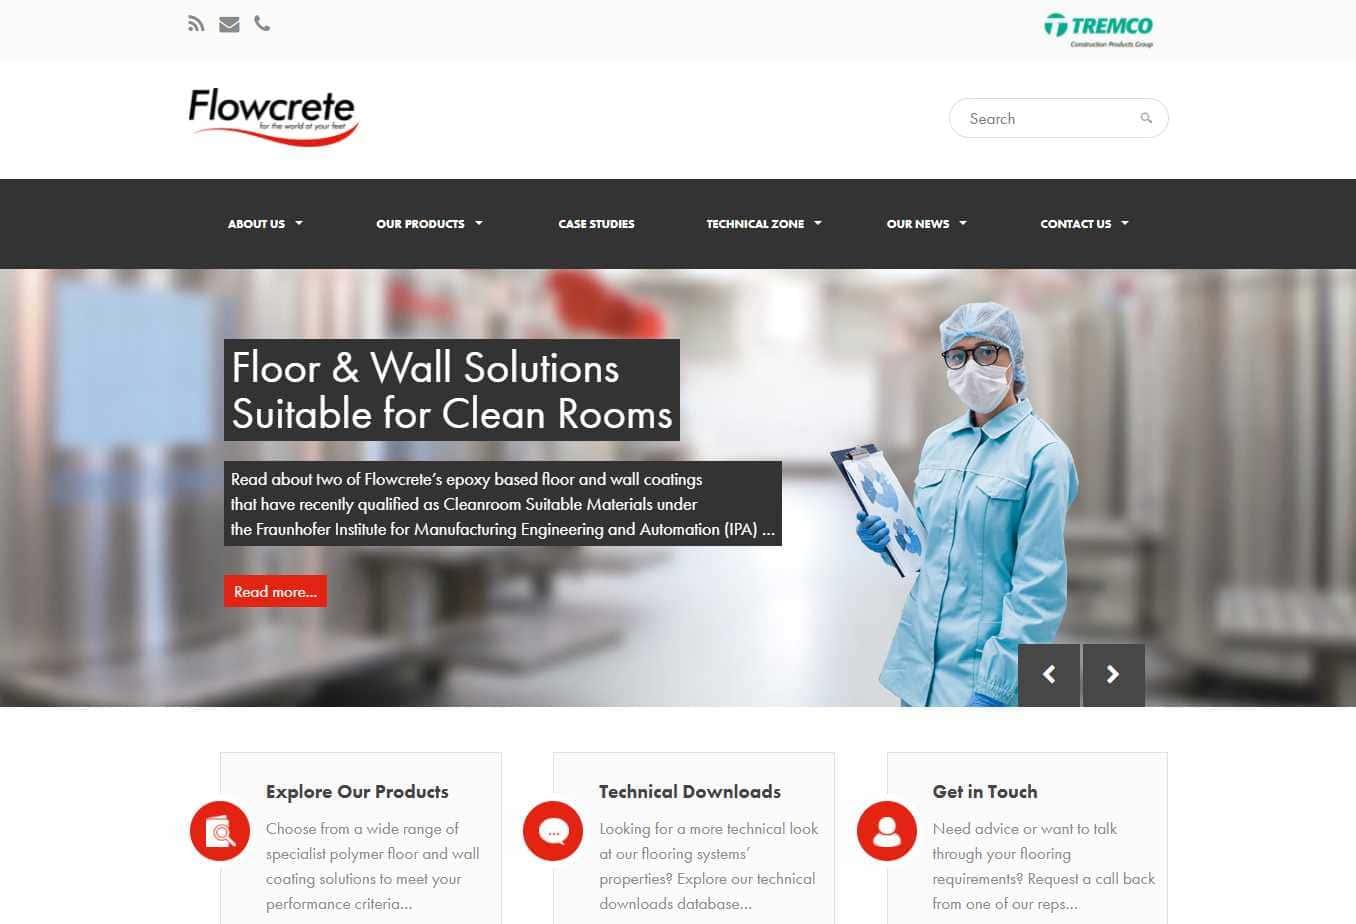 flow crete Top Epoxy Flooring Provider in Singapore